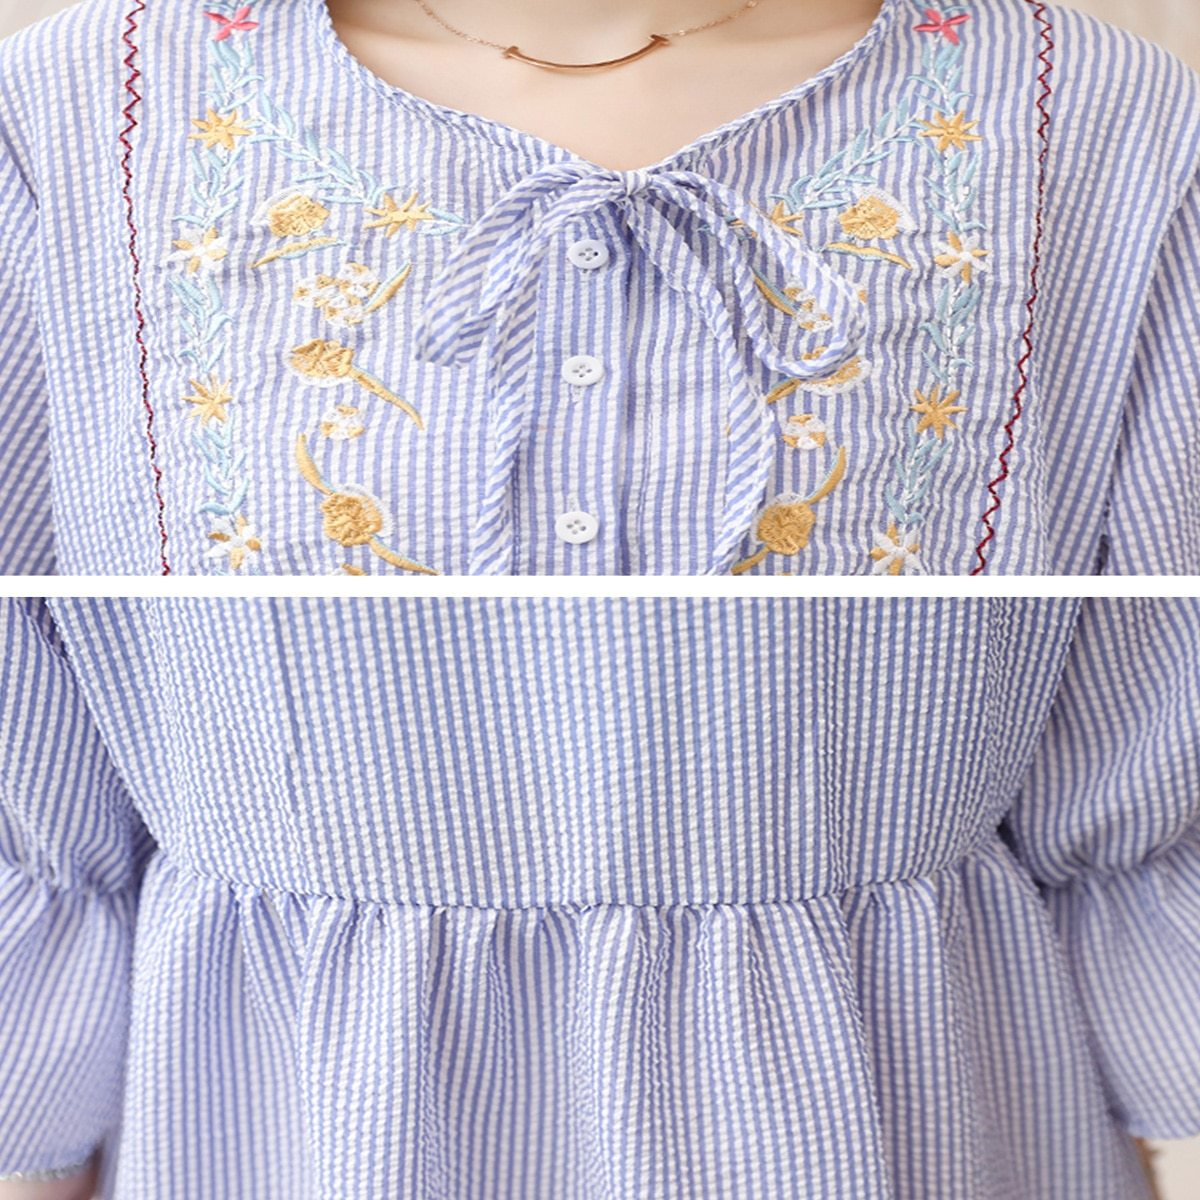 Maternity's Dress Fashion Long Sleeve Embroidery Pattern Loose Dress image 5